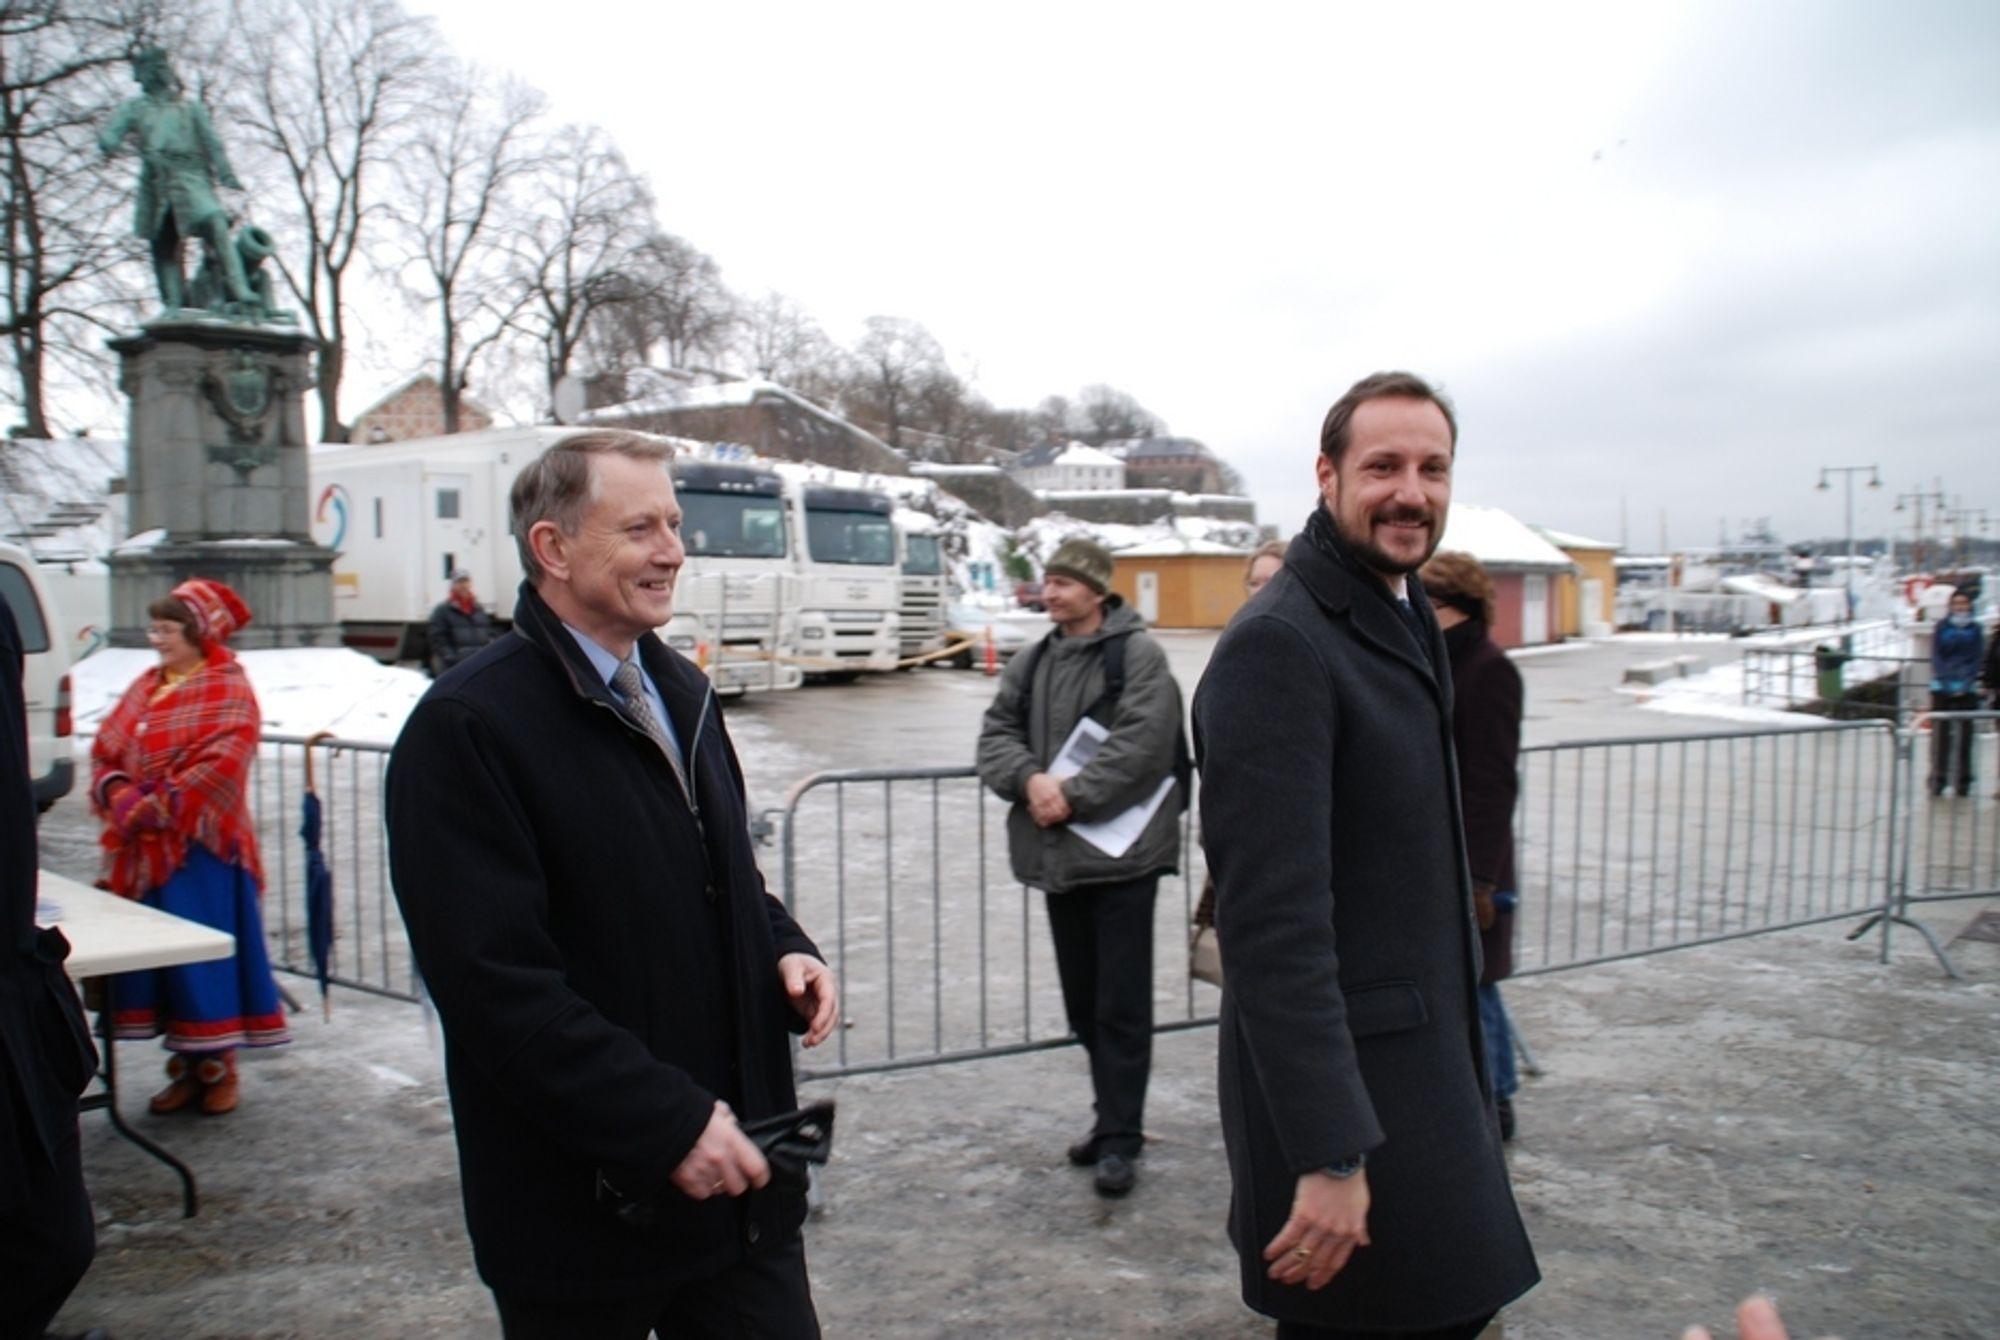 KOS:  Direktør Arvid Hallén i Norges forskningsråd solte seg i glansen av  HKH Kronprins Haakon under åpningne av Polaråret i Oslo 1. mars.